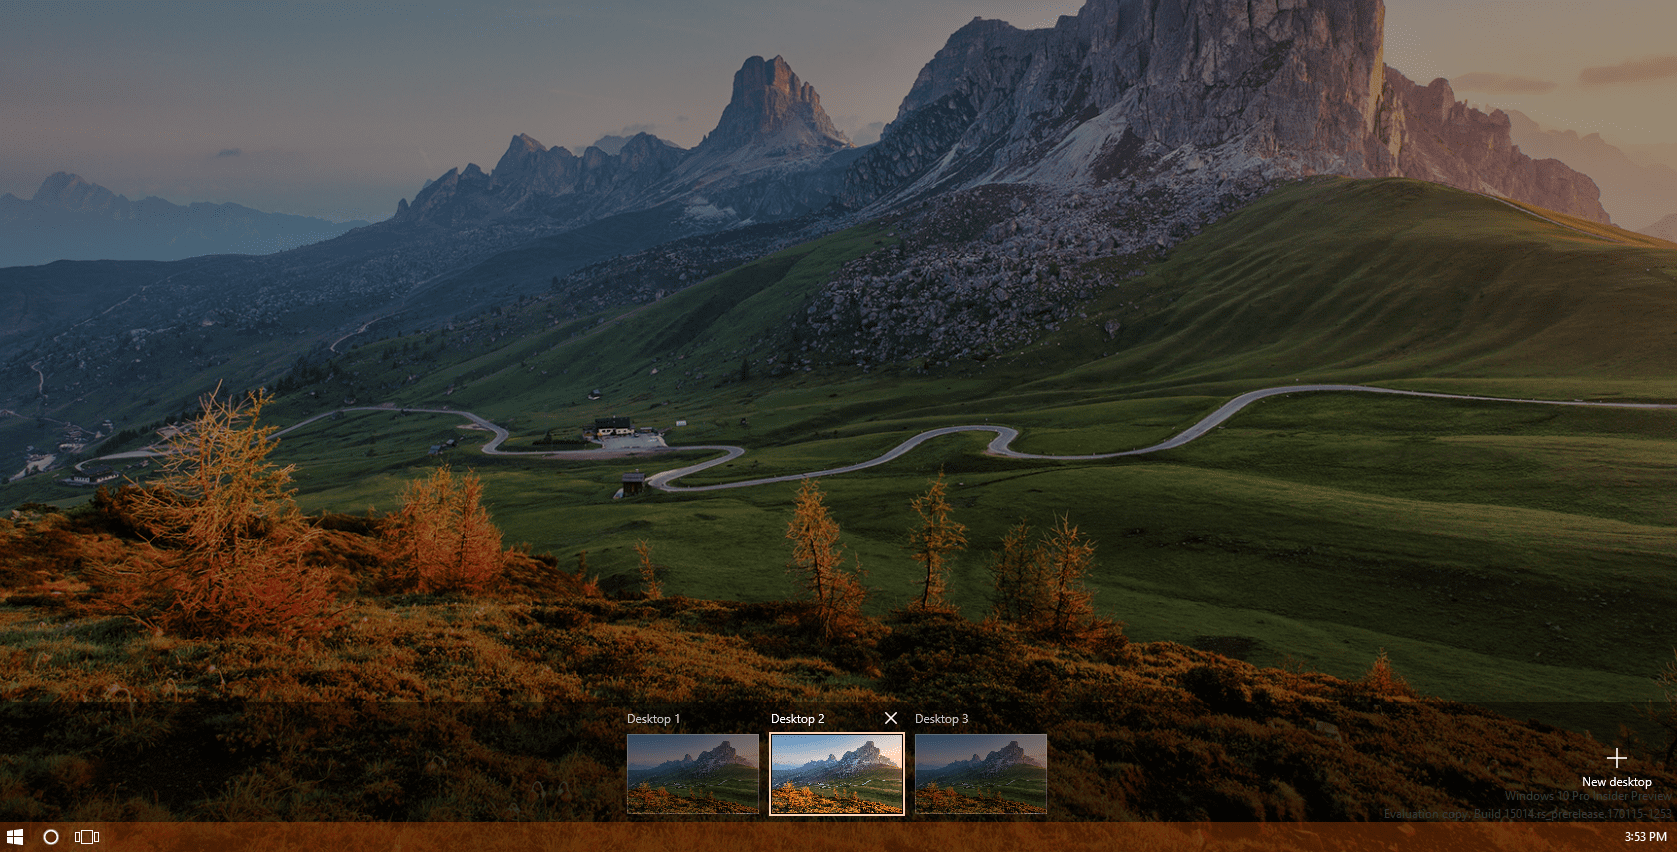 Free Lock Screen Wallpapers: How To Set Spotlight Lock Screen Image As Wallpaper On